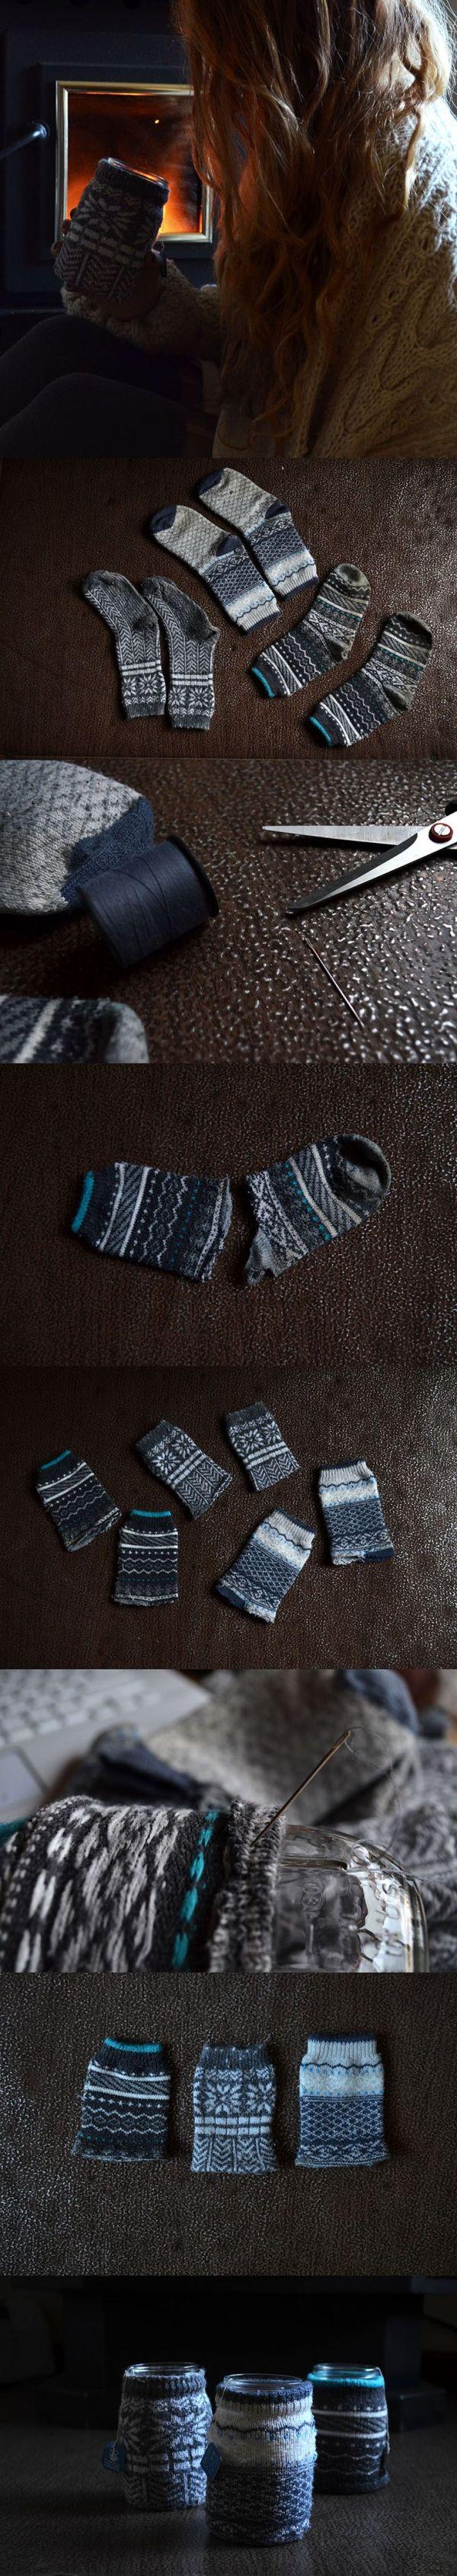 DIY // Mason Jar Cozy Hot Drink Sleeve from Old Socks ...